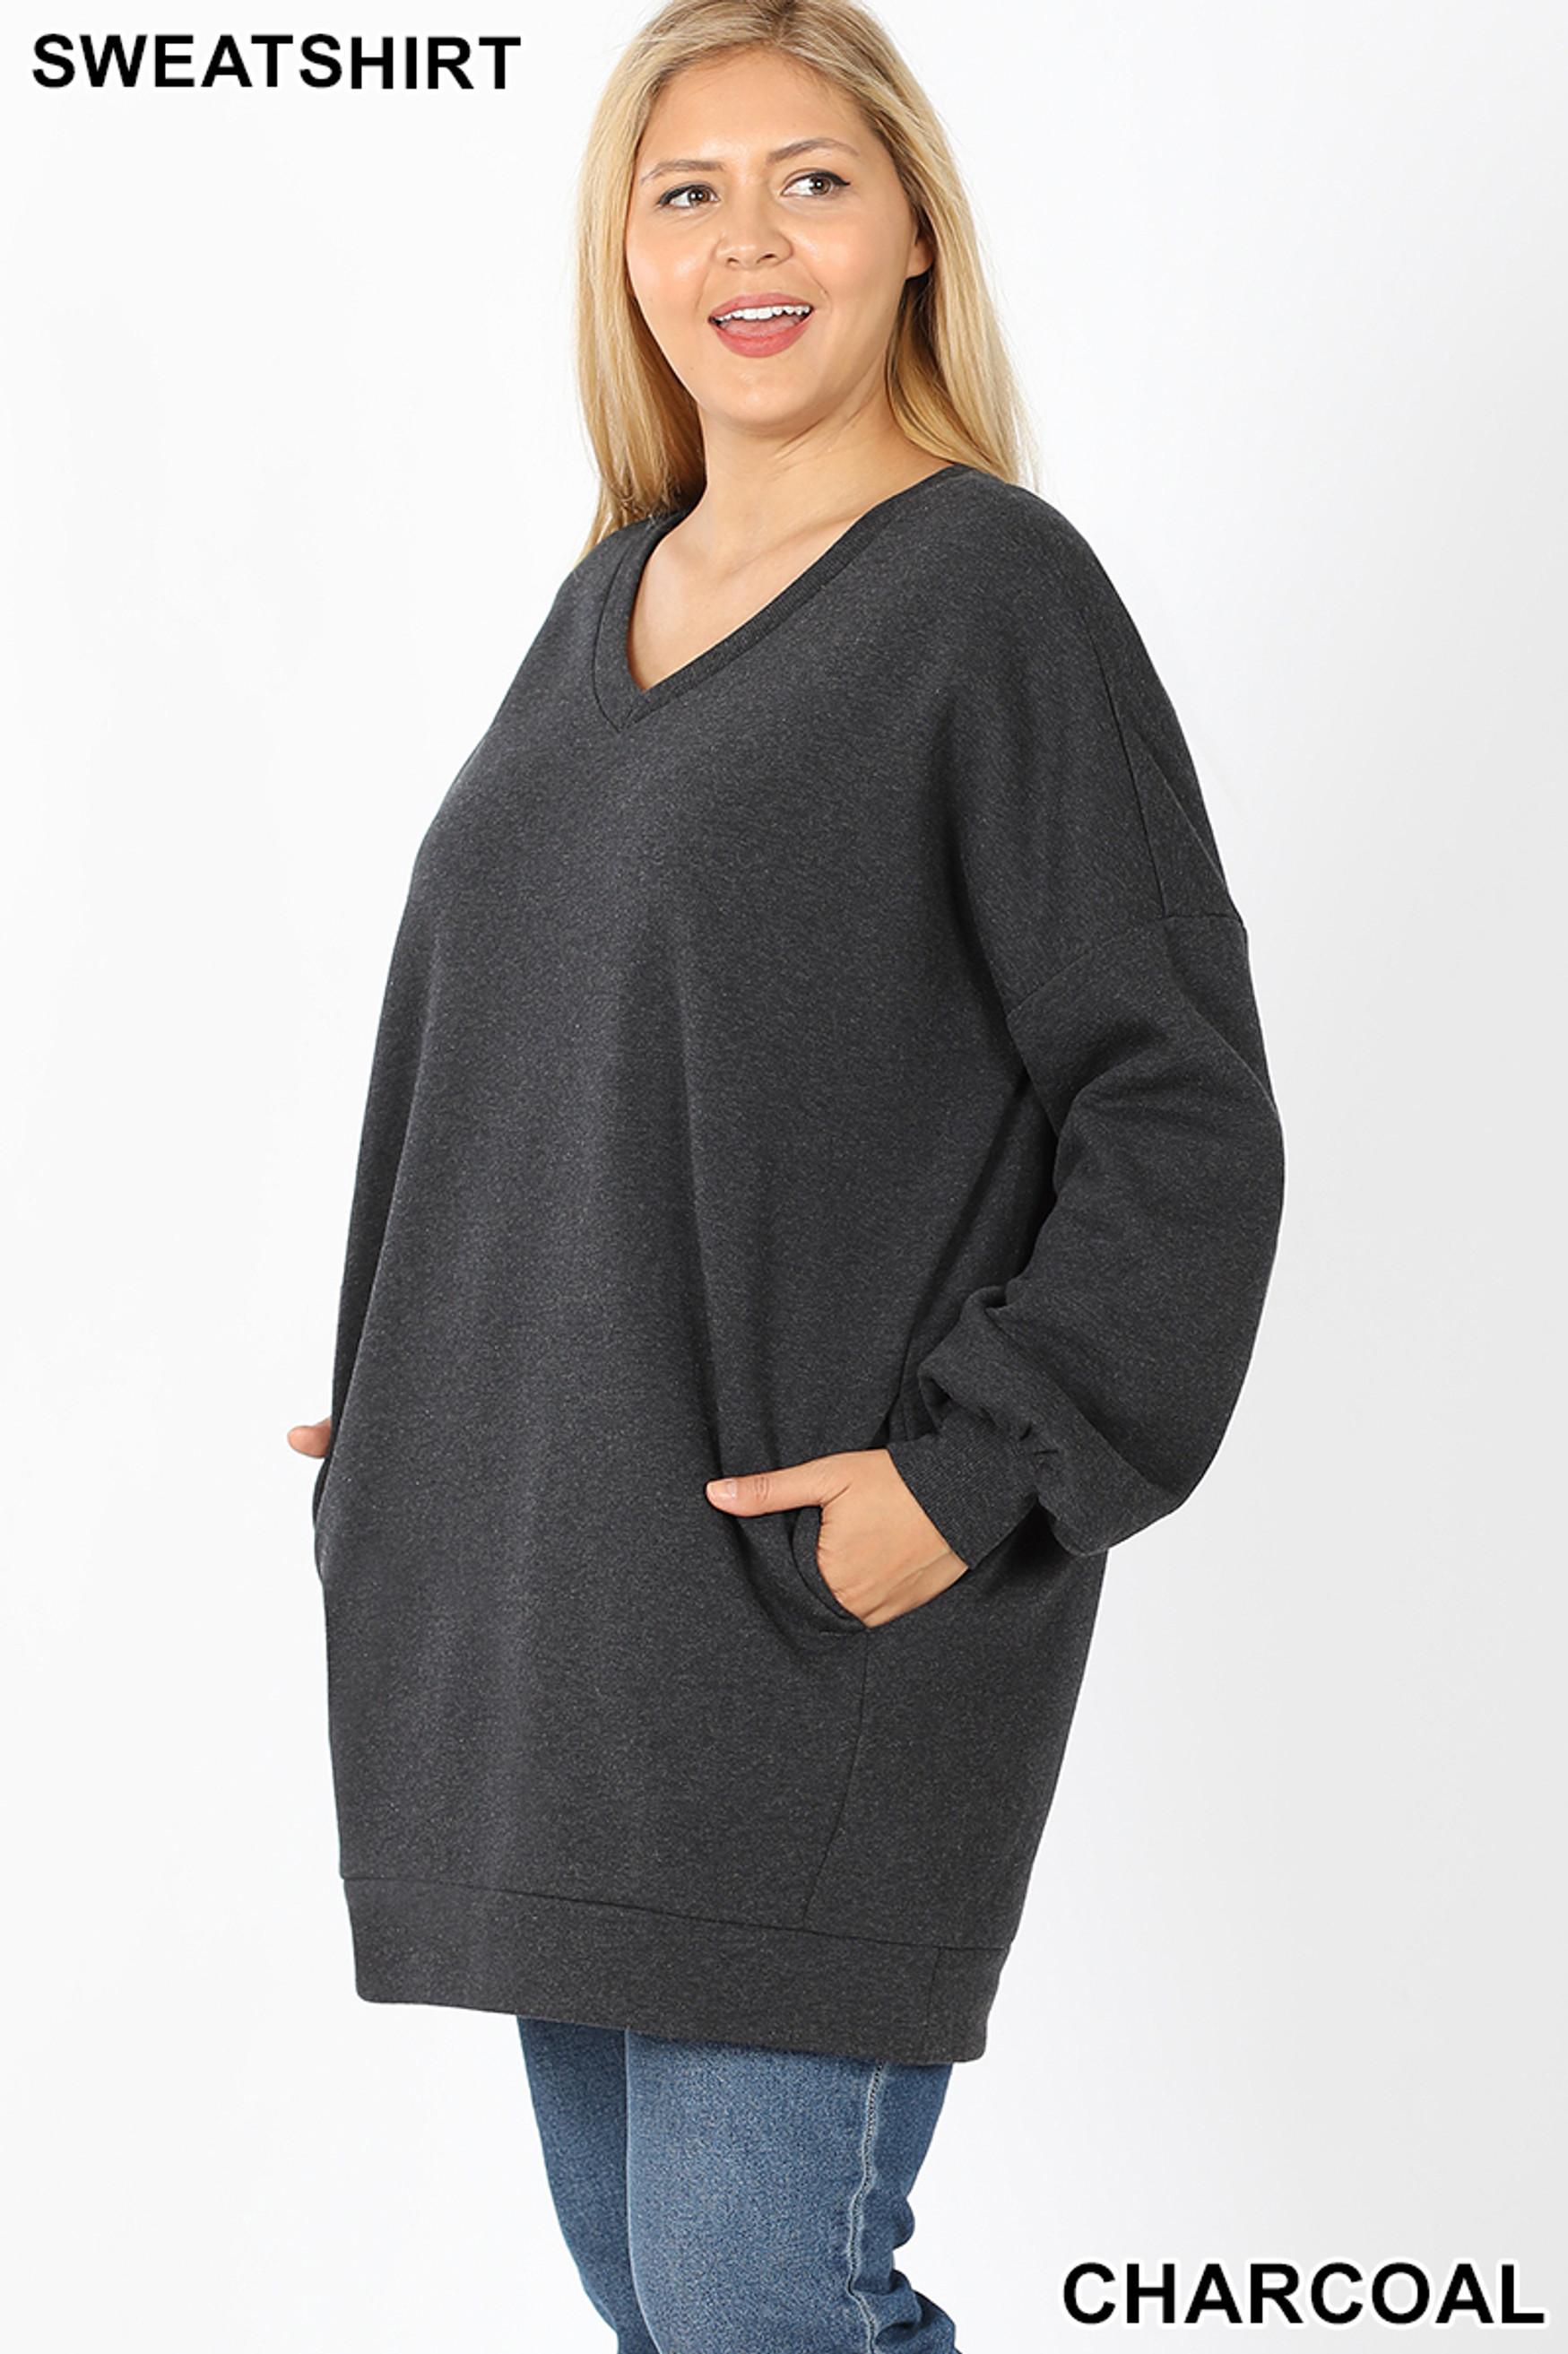 45 degree image of Charcoal Oversized V-Neck Longline Plus Size Sweatshirt with Pockets